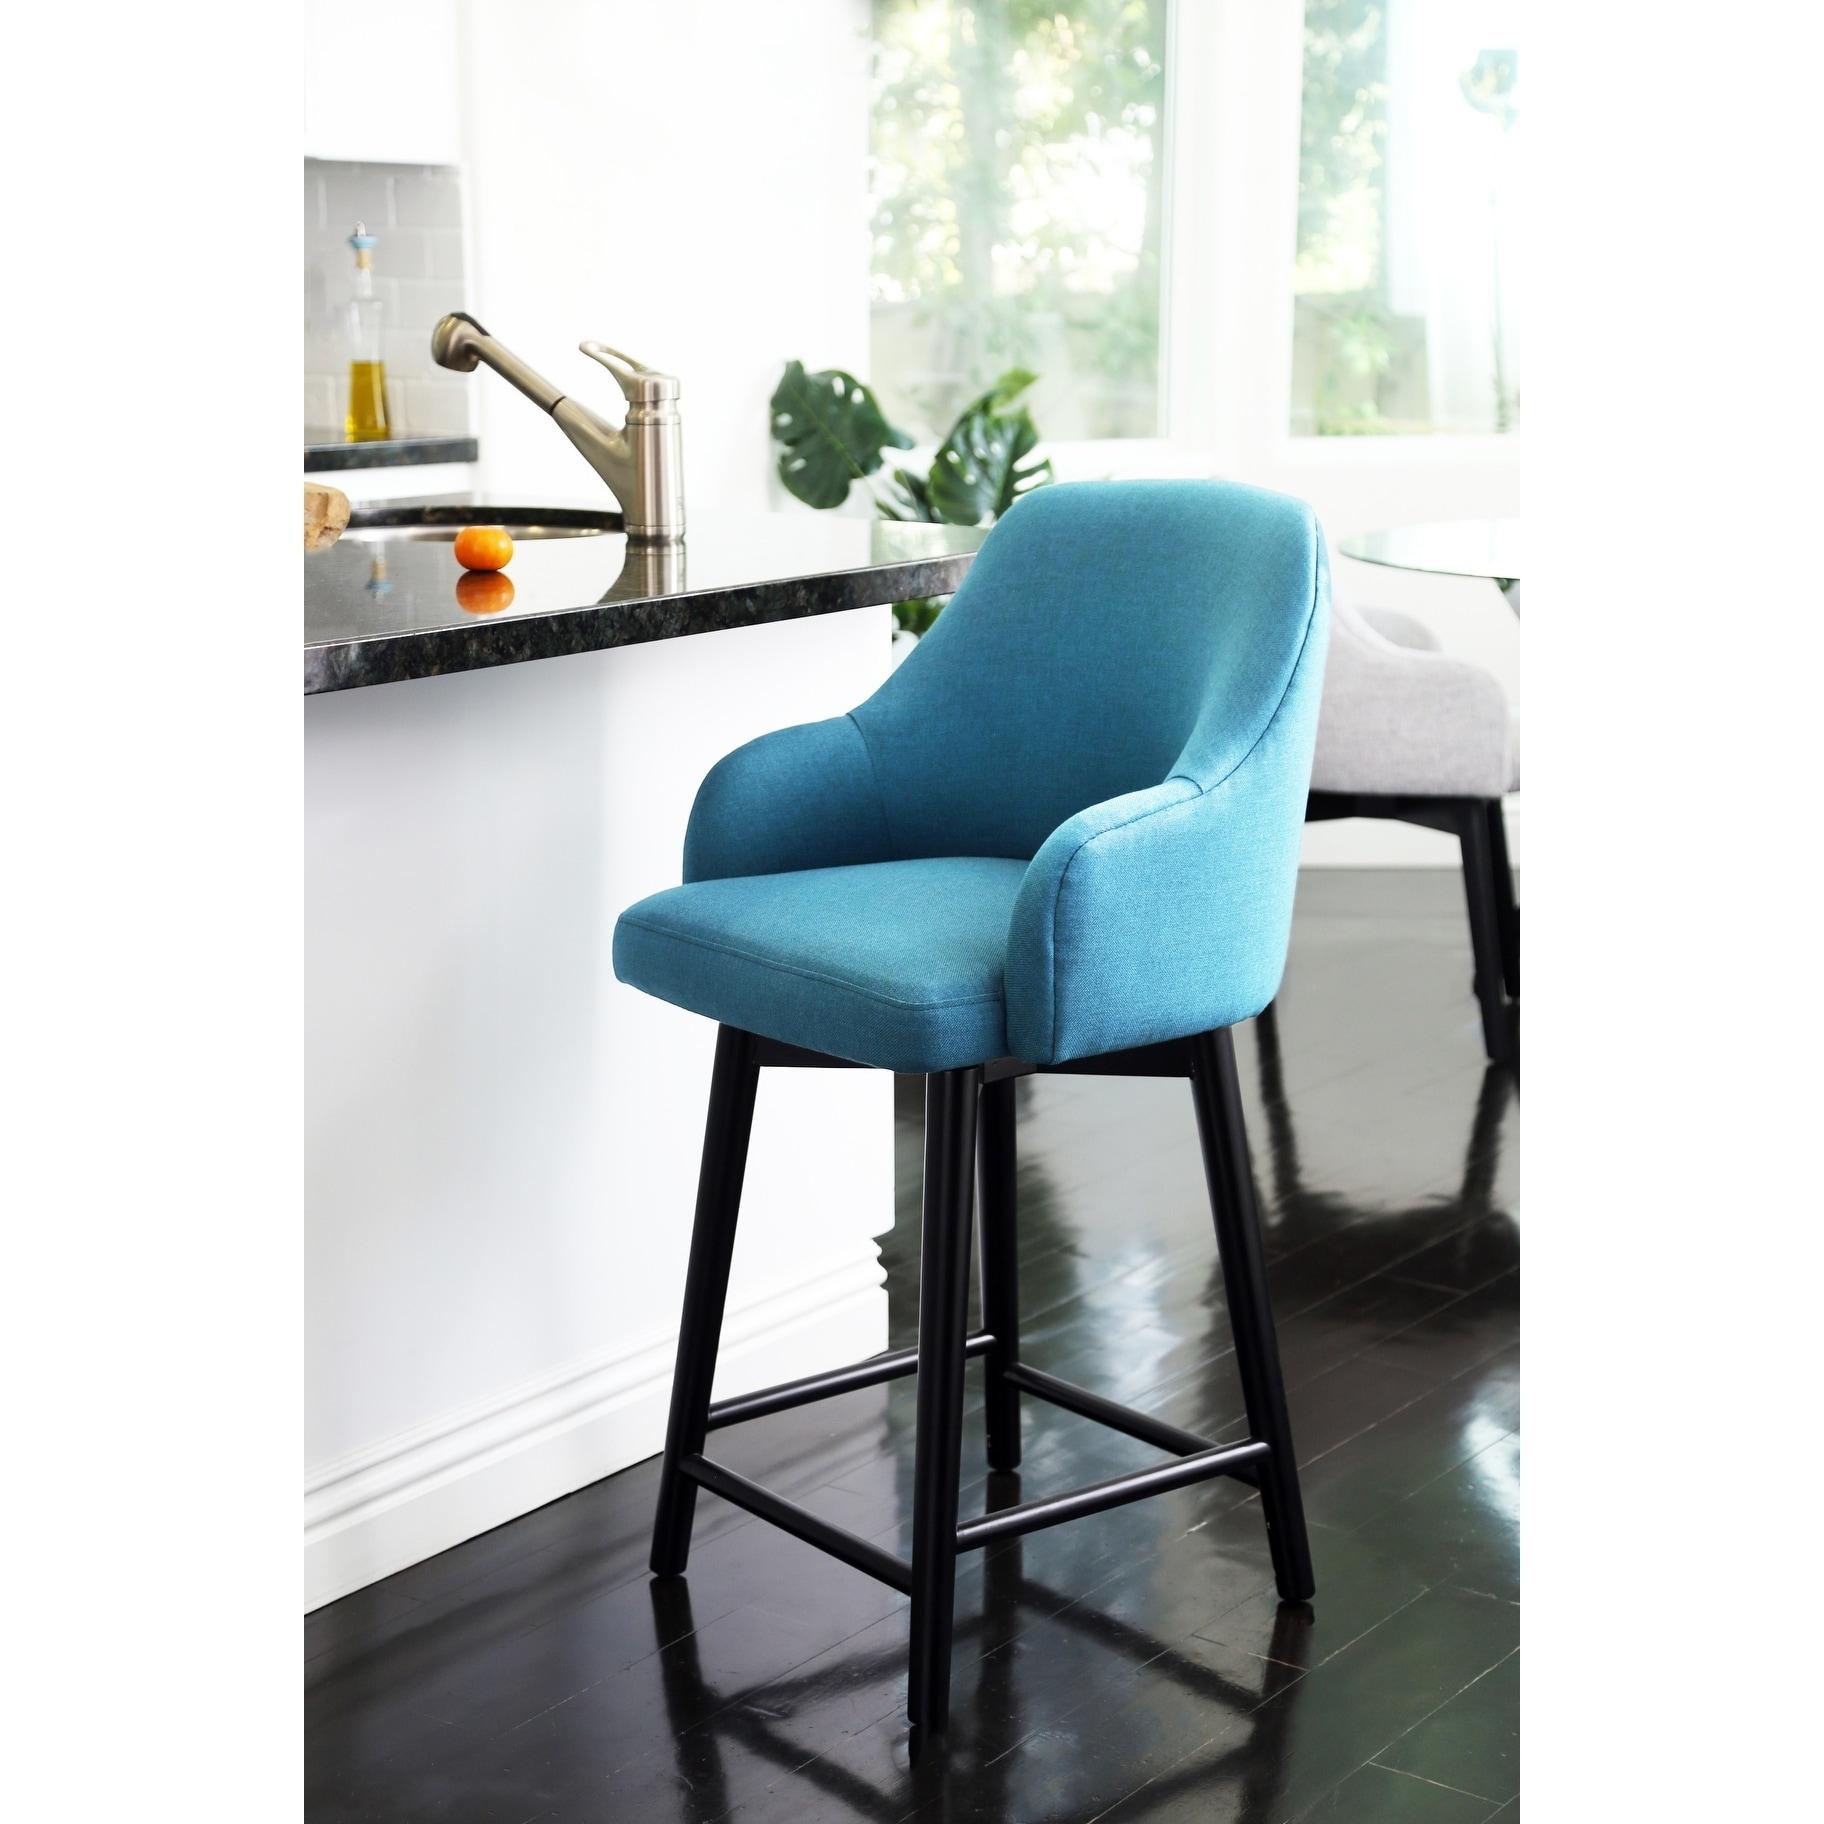 Shop Abbyson Abbott Upholstered 26-inch Counter Stool - On Sale ...